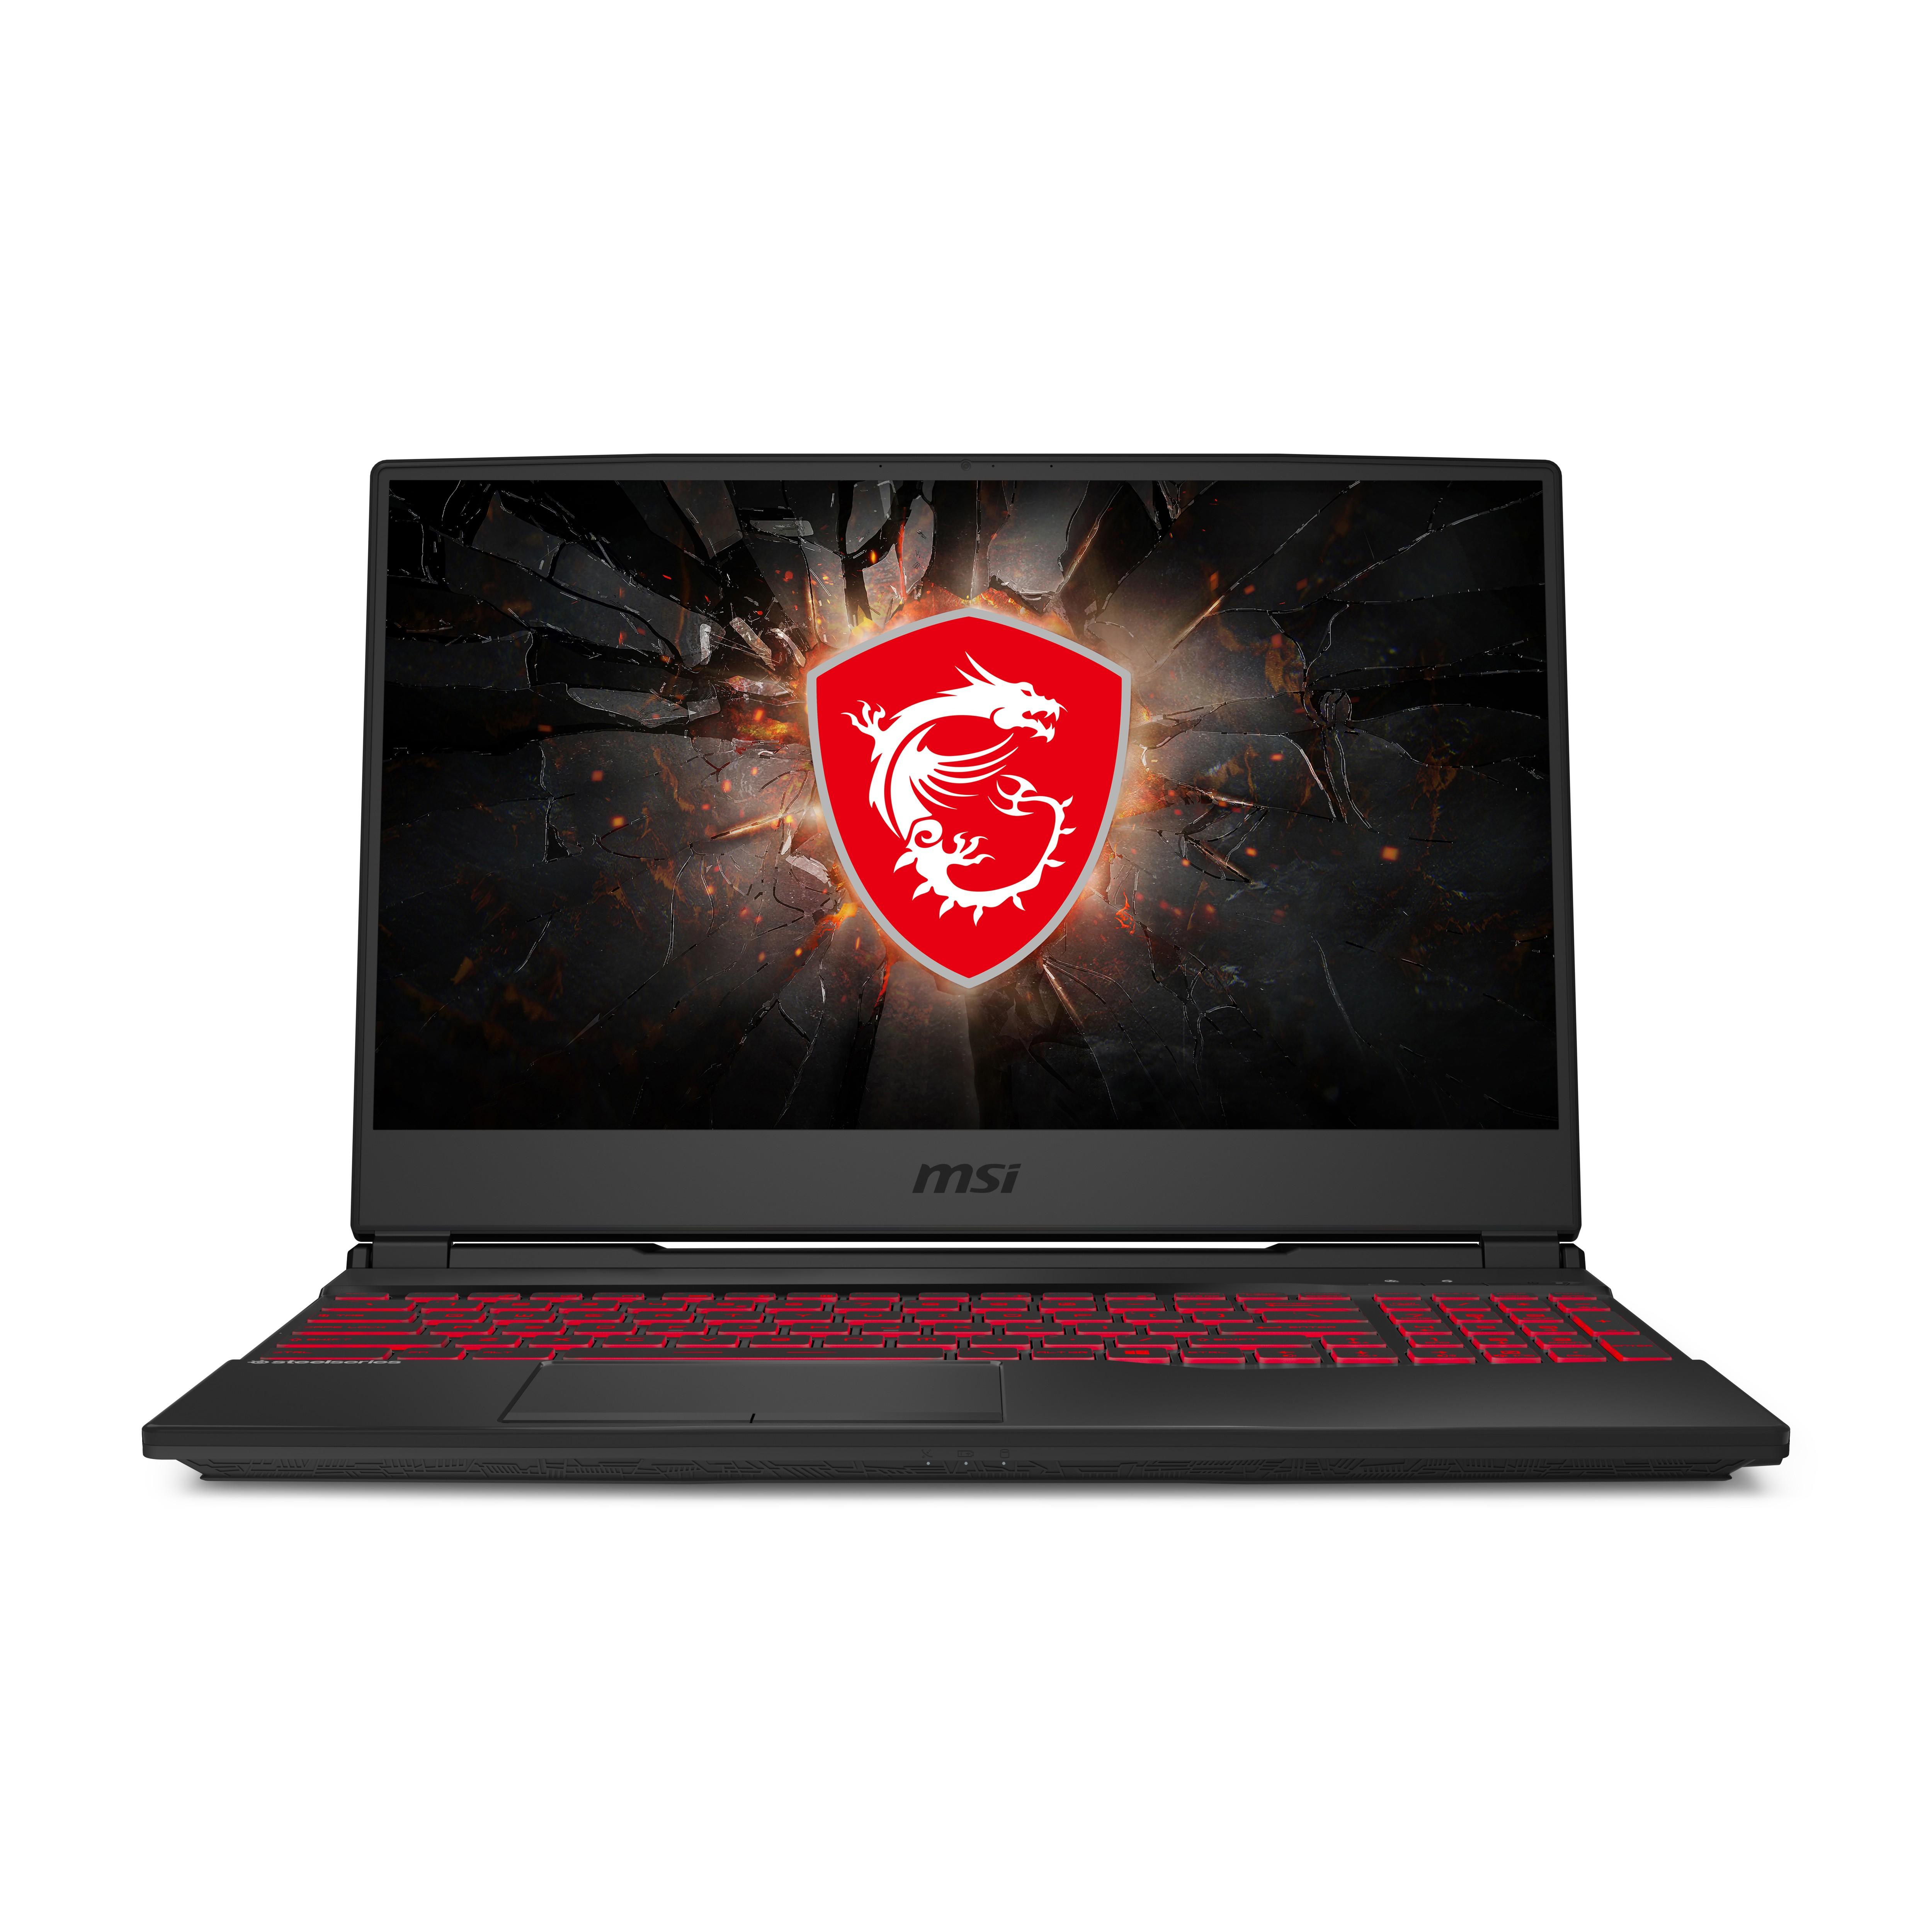 "MSI Gaming GL65 10SFSK-289NL Leopard Notebook 39,6 cm (15.6"") Full HD Intel® 10de generatie Core™ i7 16 GB DDR4-SDRAM 512 GB SSD NVIDIA GeForce RTX 2070 SUPER Wi-Fi 6 (802.11ax) Windows 10 Home Zwart"